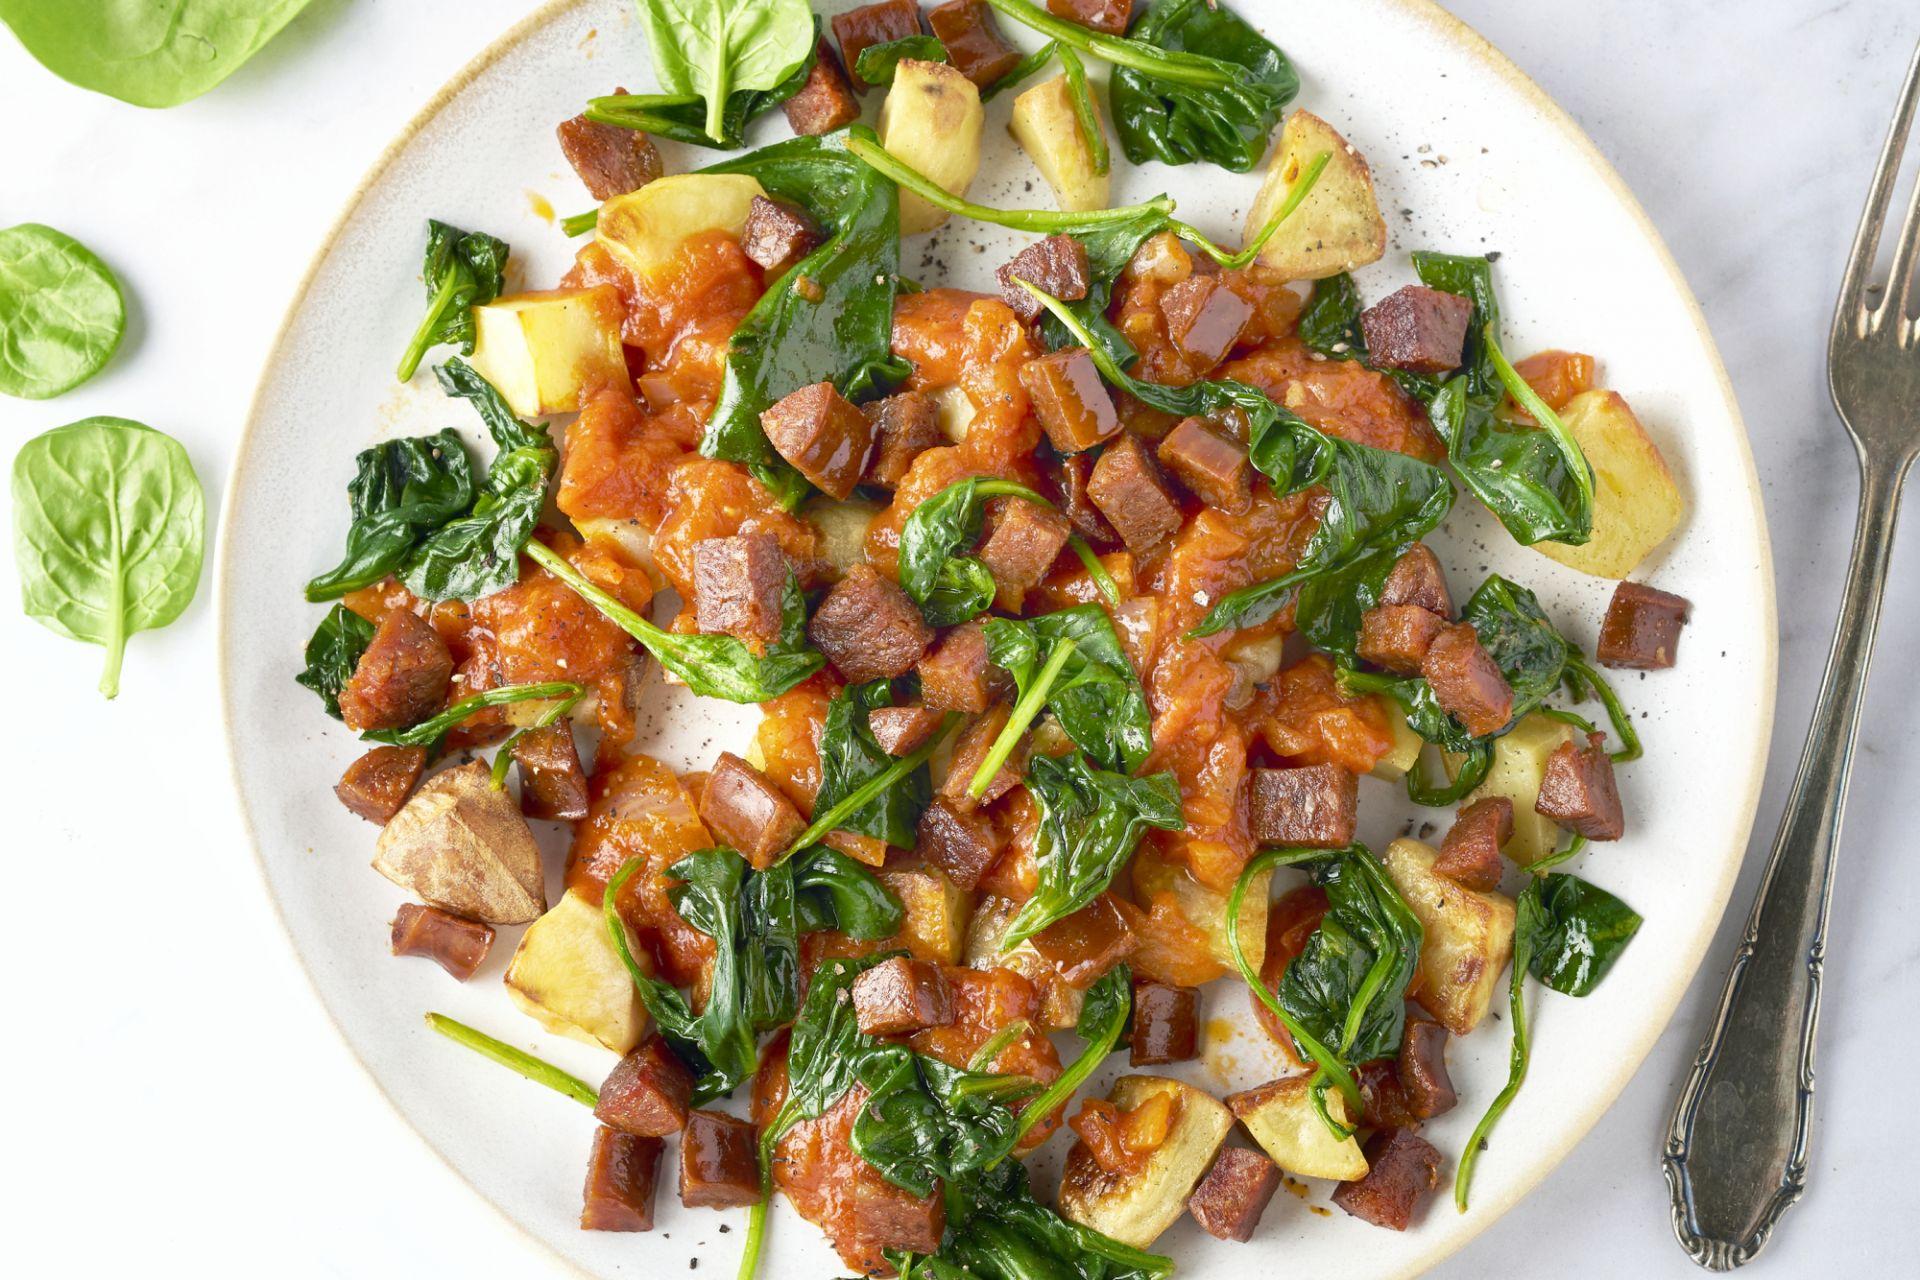 Patatas bravas met chorizo en spinazie